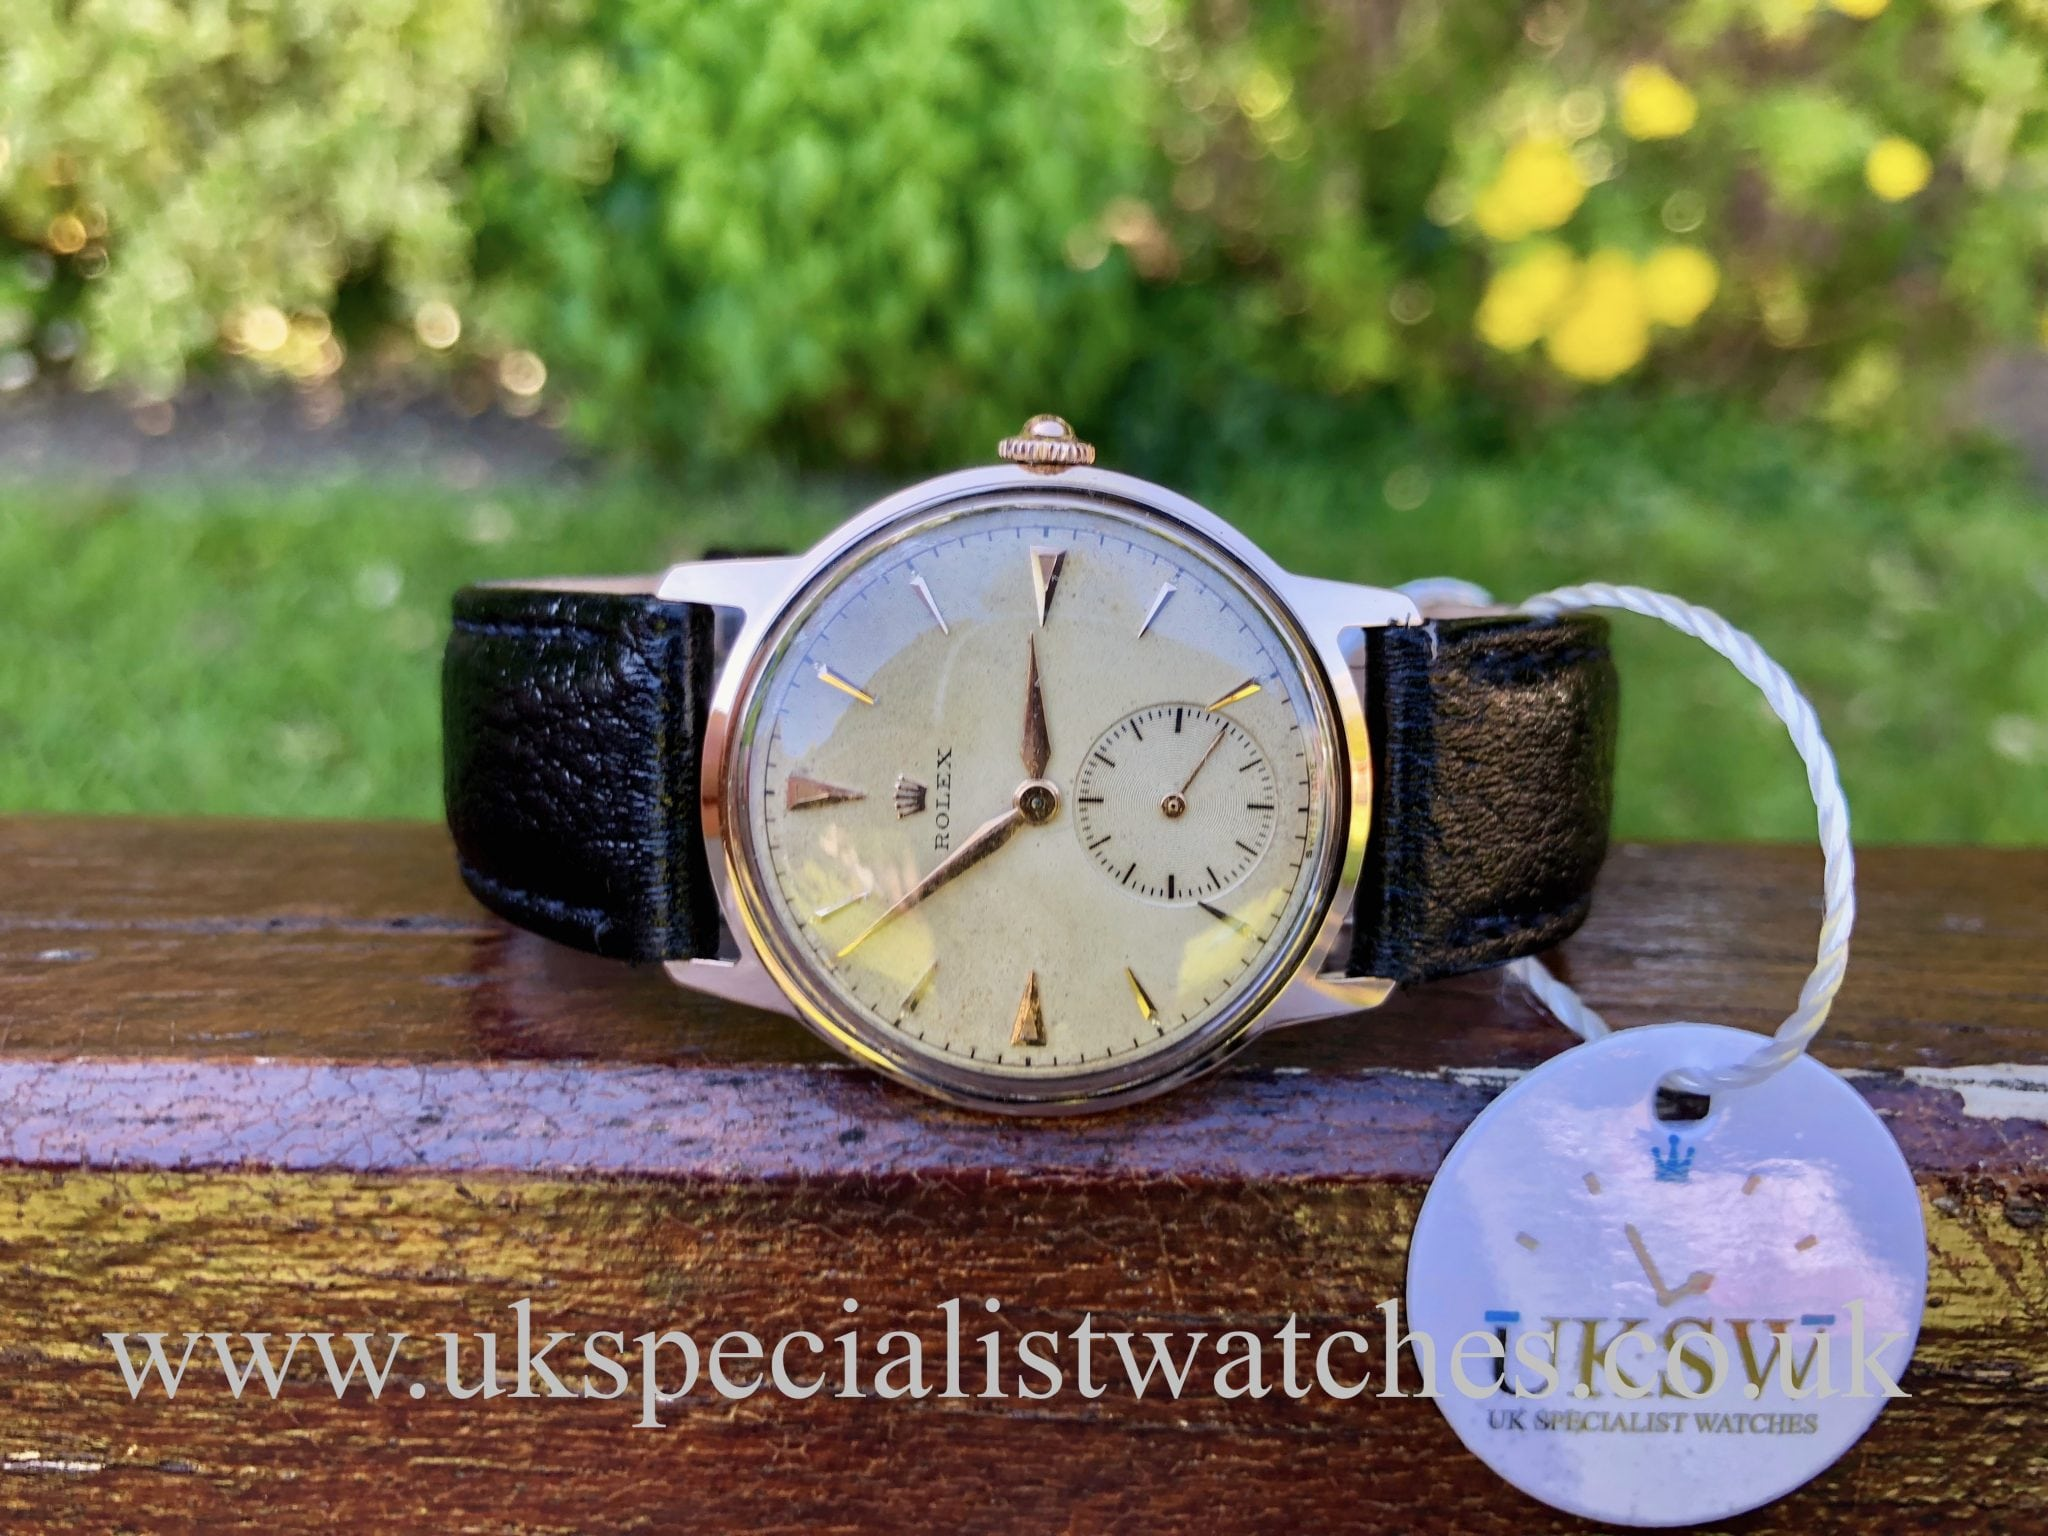 Rolex Gents 18ct Rose Gold Vintage 1950s Uk Specialist Watches